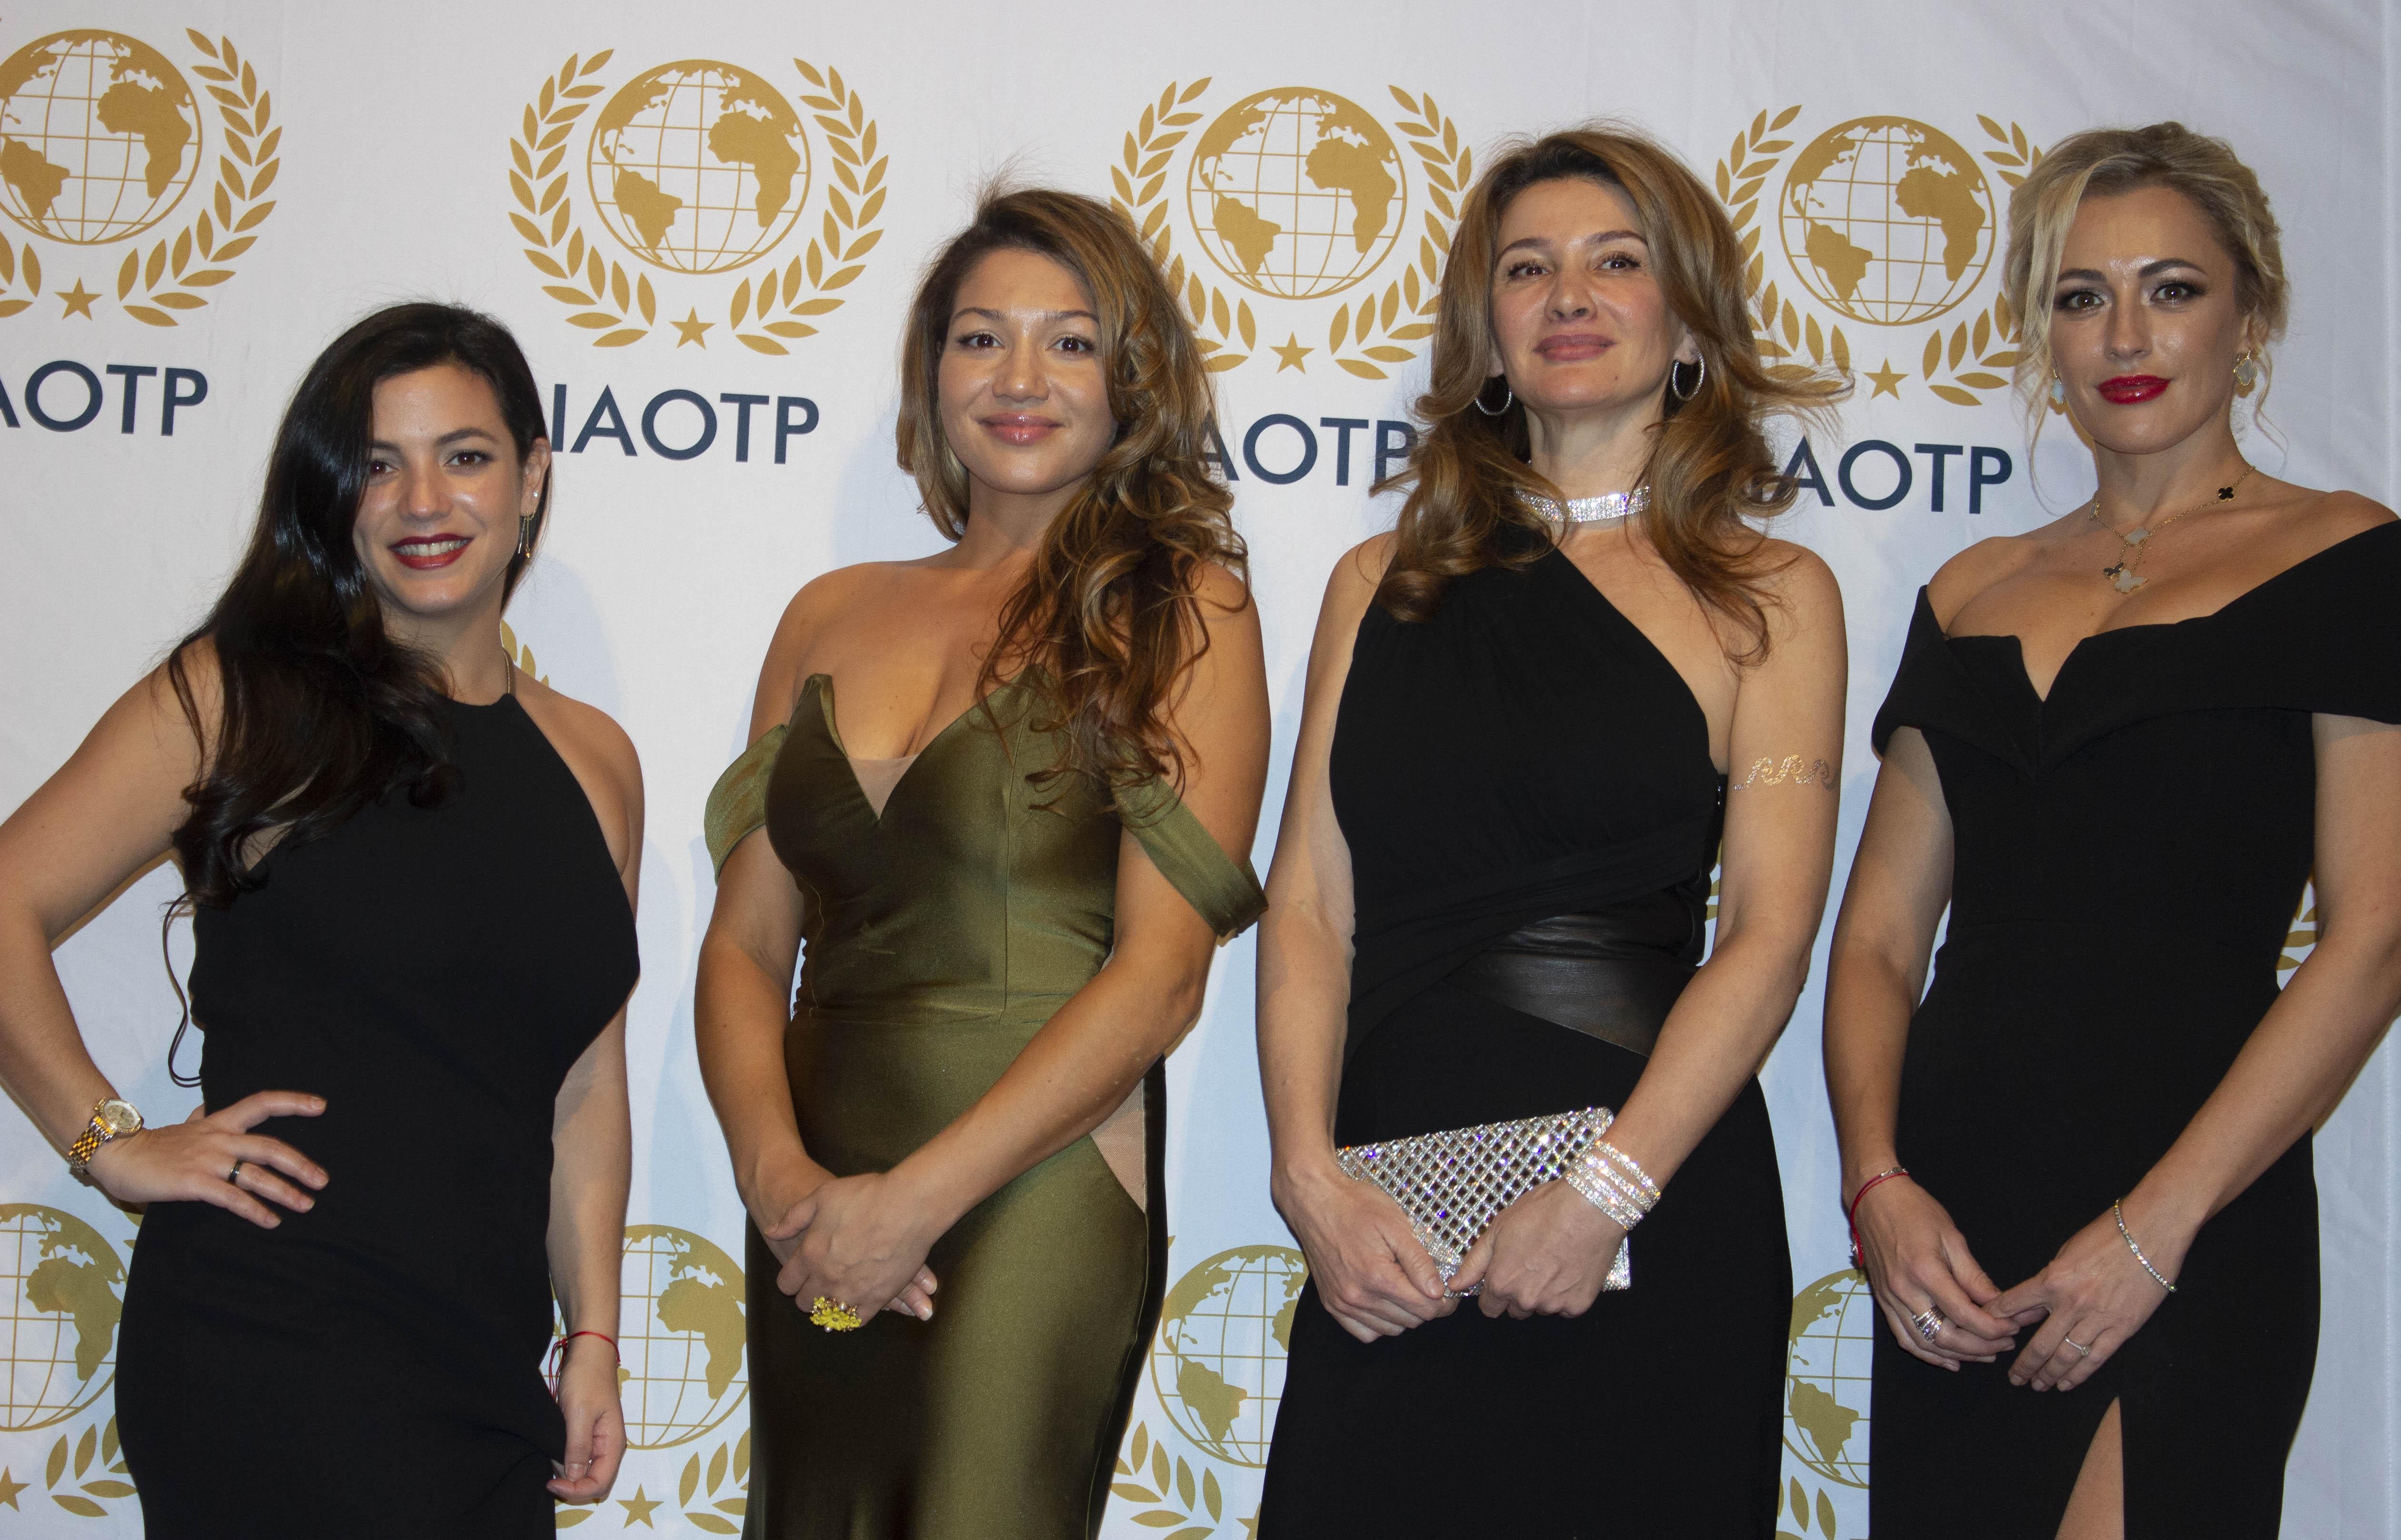 AMC Celebrates the IAOTP Awards at the Plaza! 2